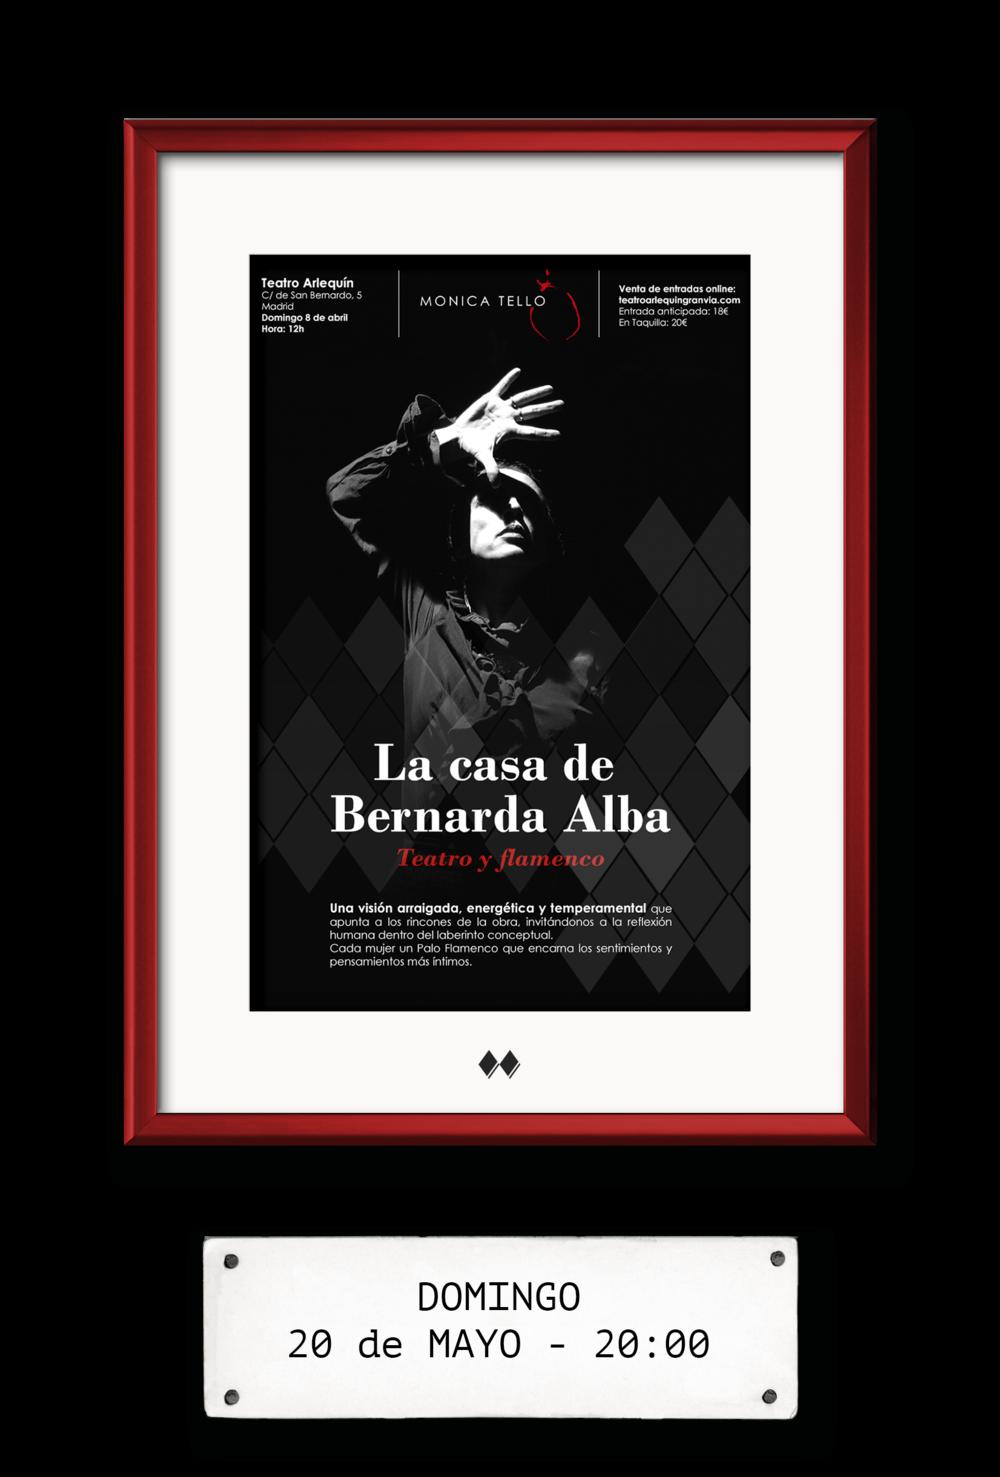 cuadro-lorca-casa-bernarda-alba-monica-tello-flamenco-baile-teatro-arlequin-gran-via.png